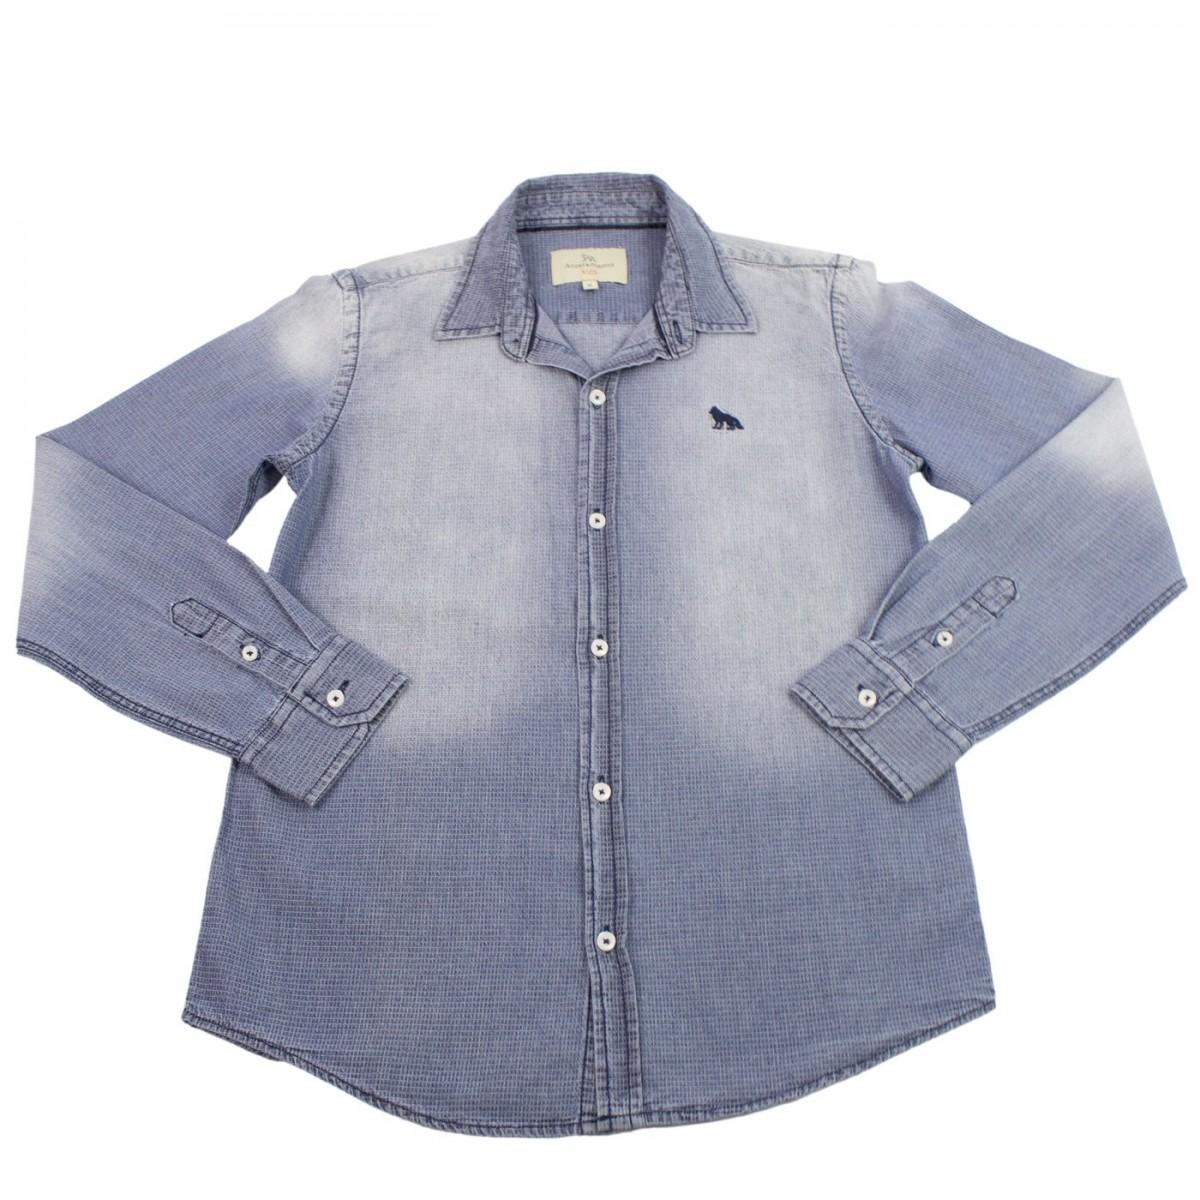 b365a2826b Bizz Store - Camisa Jeans Infantil Masculina Acostamento